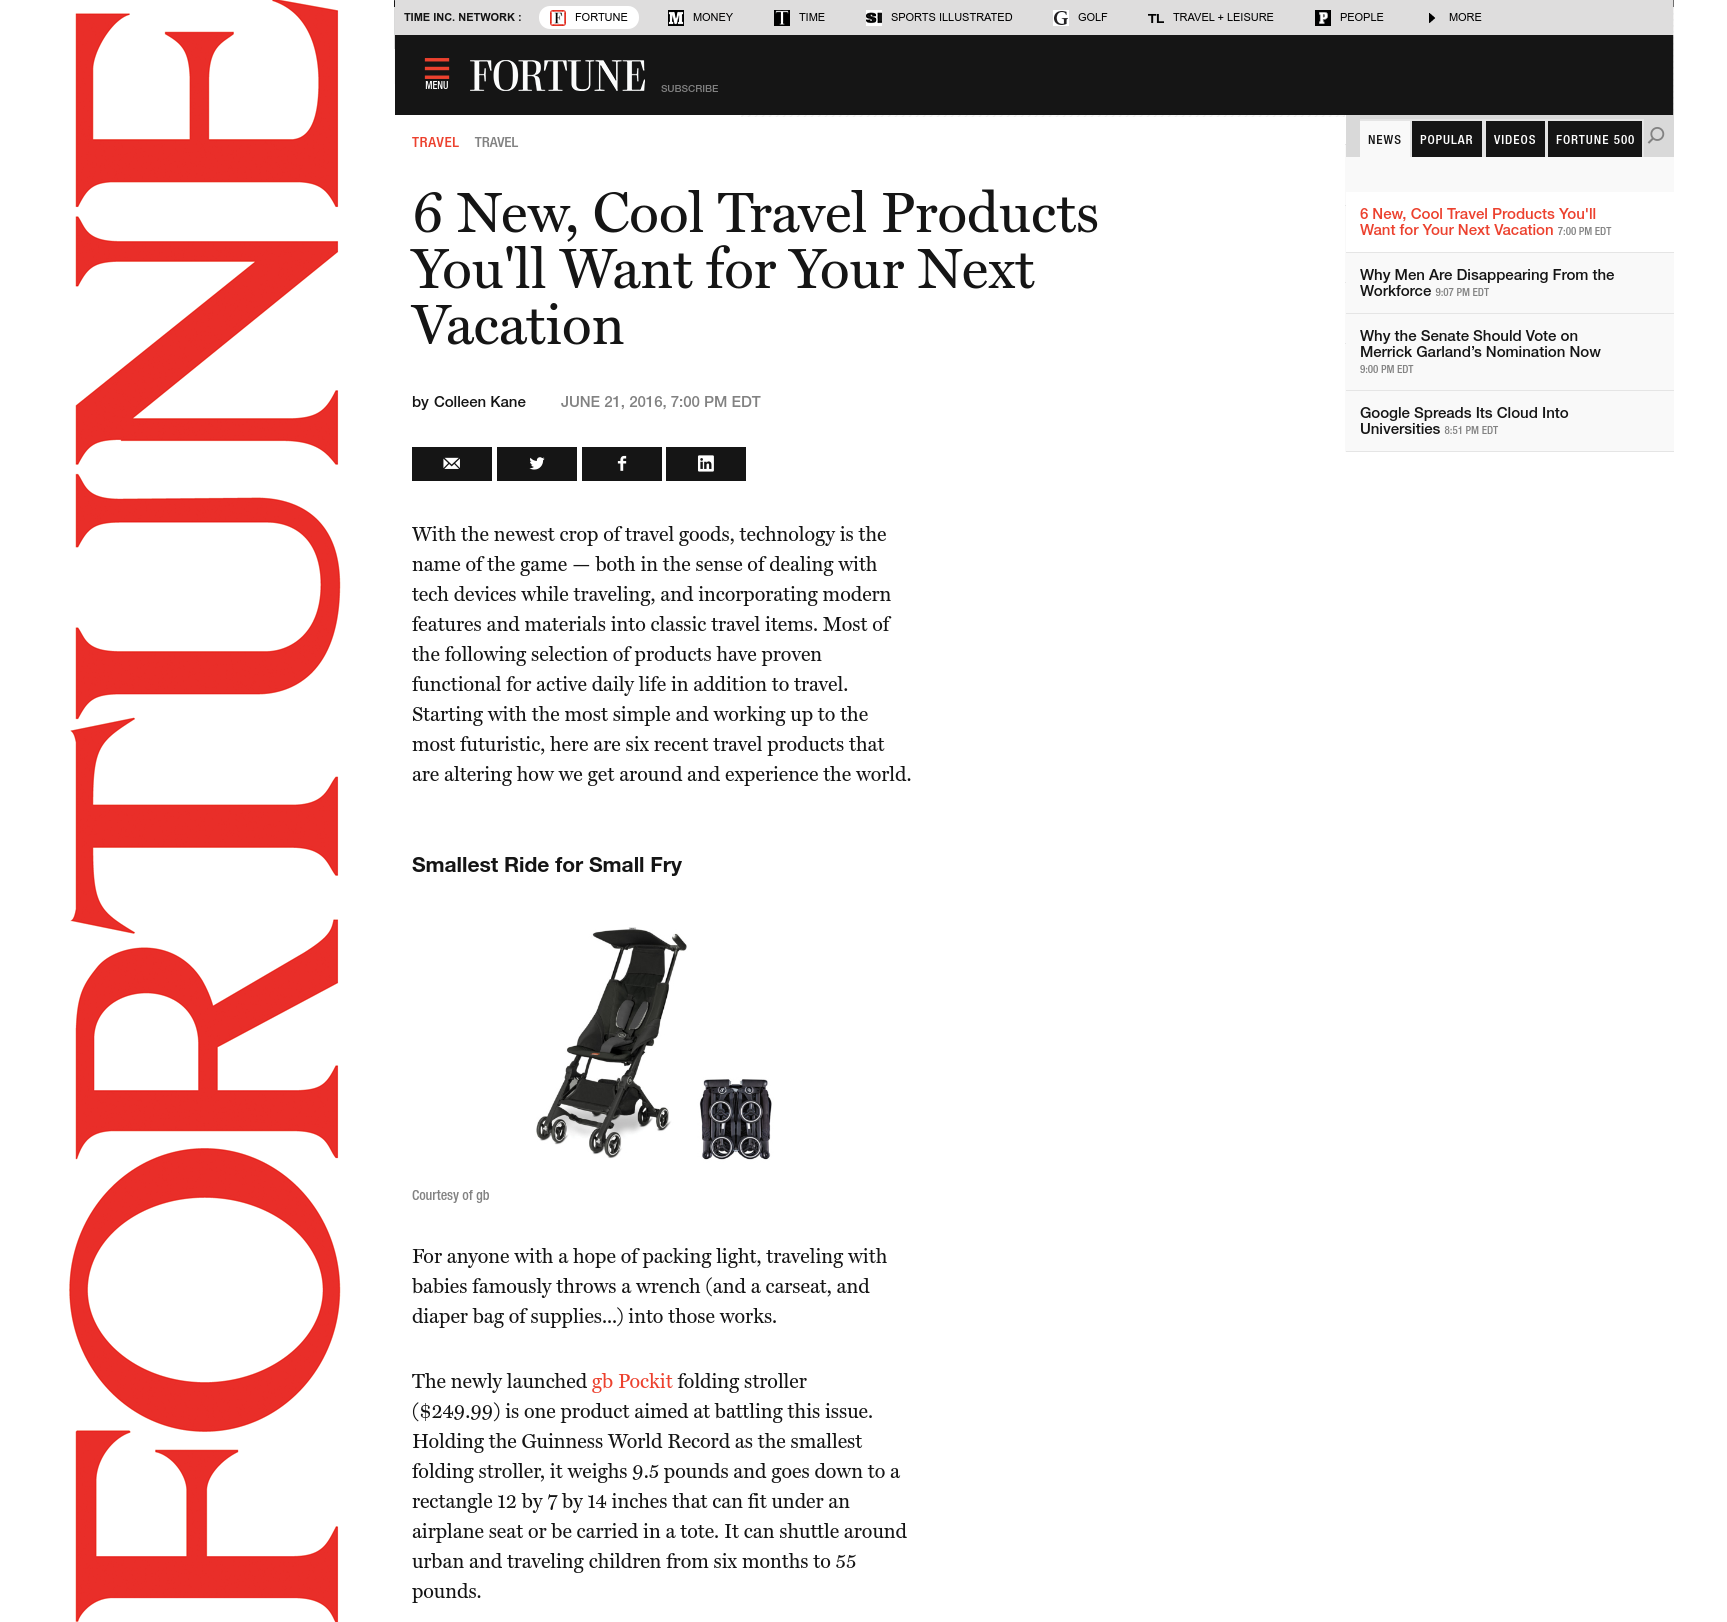 (Fortune) fortune.com_gb Pockit